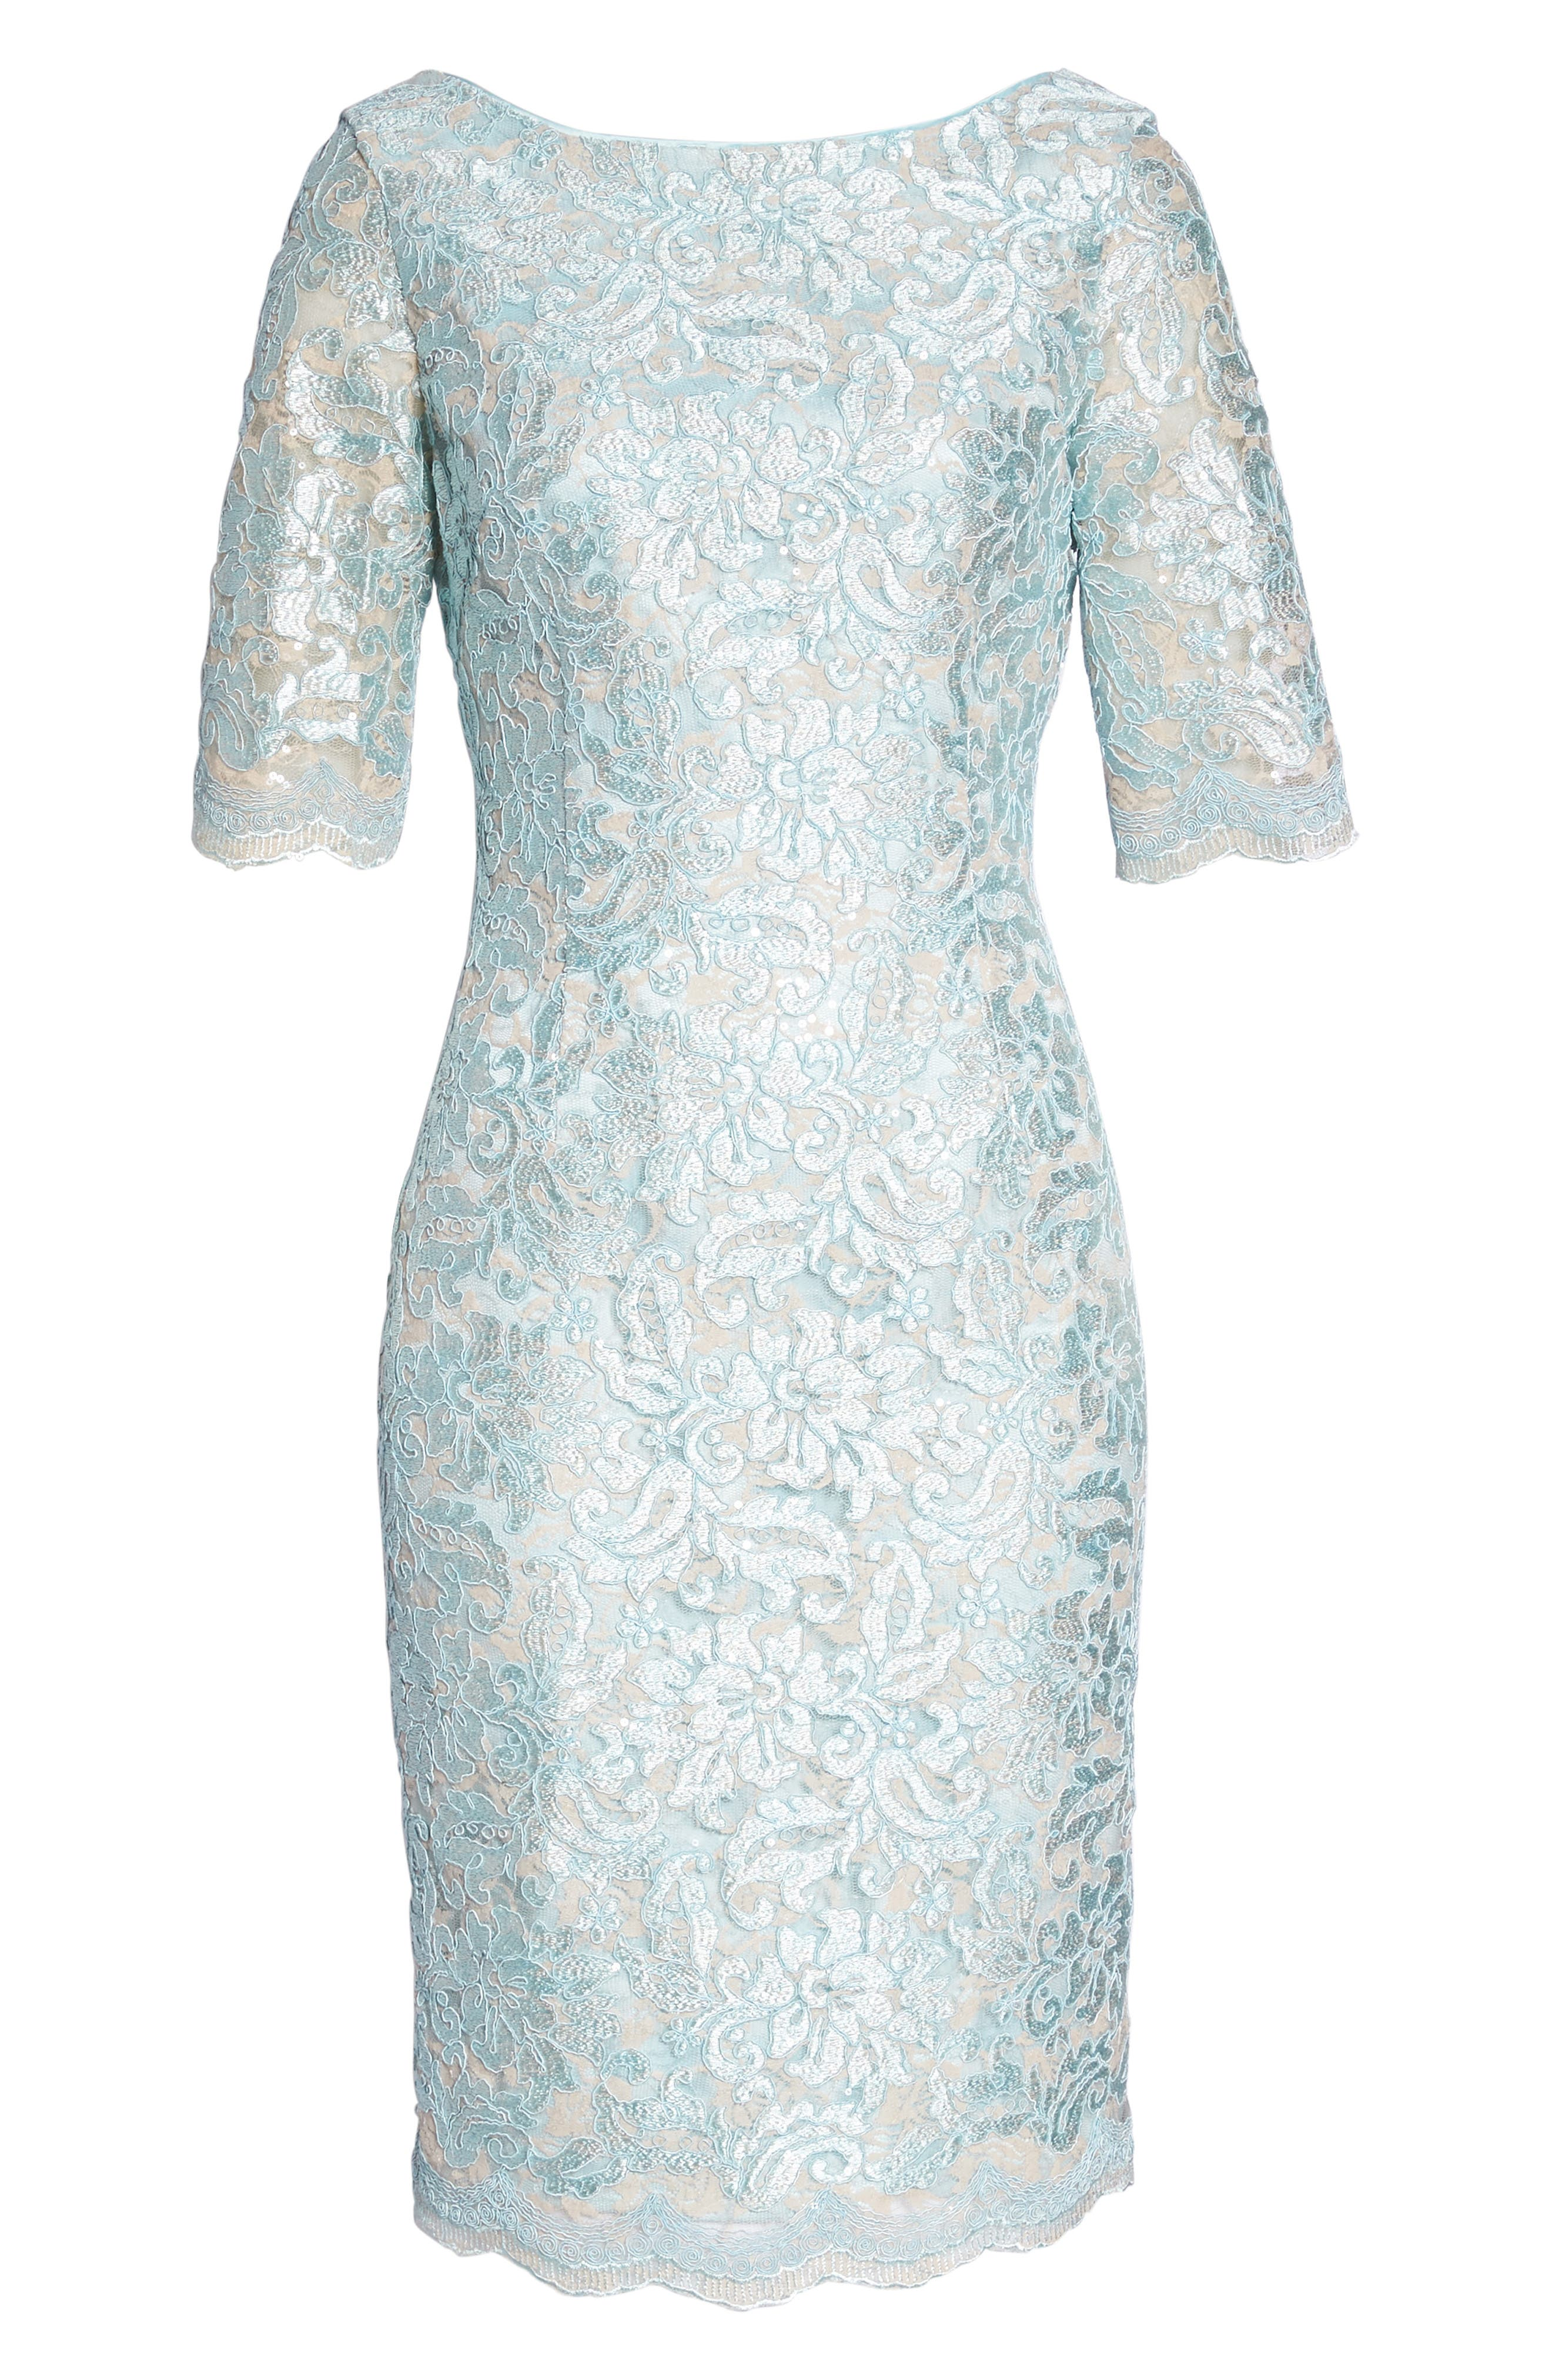 ELIZA J,                             Lace Sheath Dress,                             Alternate thumbnail 7, color,                             330